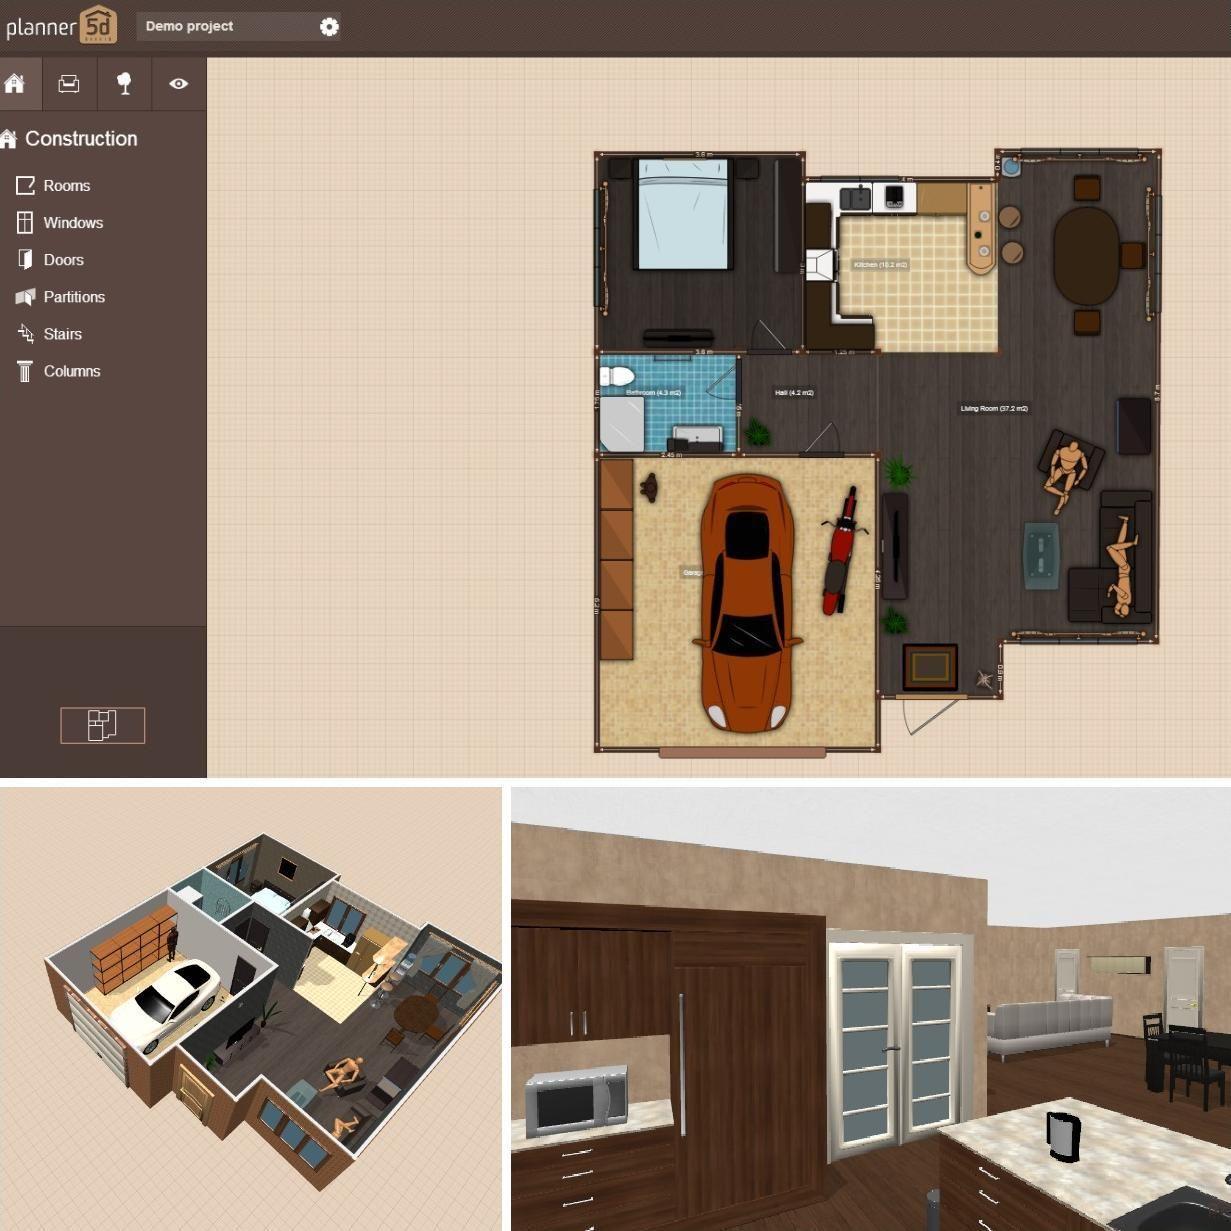 Interior Design Software 3d Arrange A Room Online Free Looks So Amazing Kitchen Room Minimalism Room Inspiring And Interes Design My Room Cool Kitchens Design